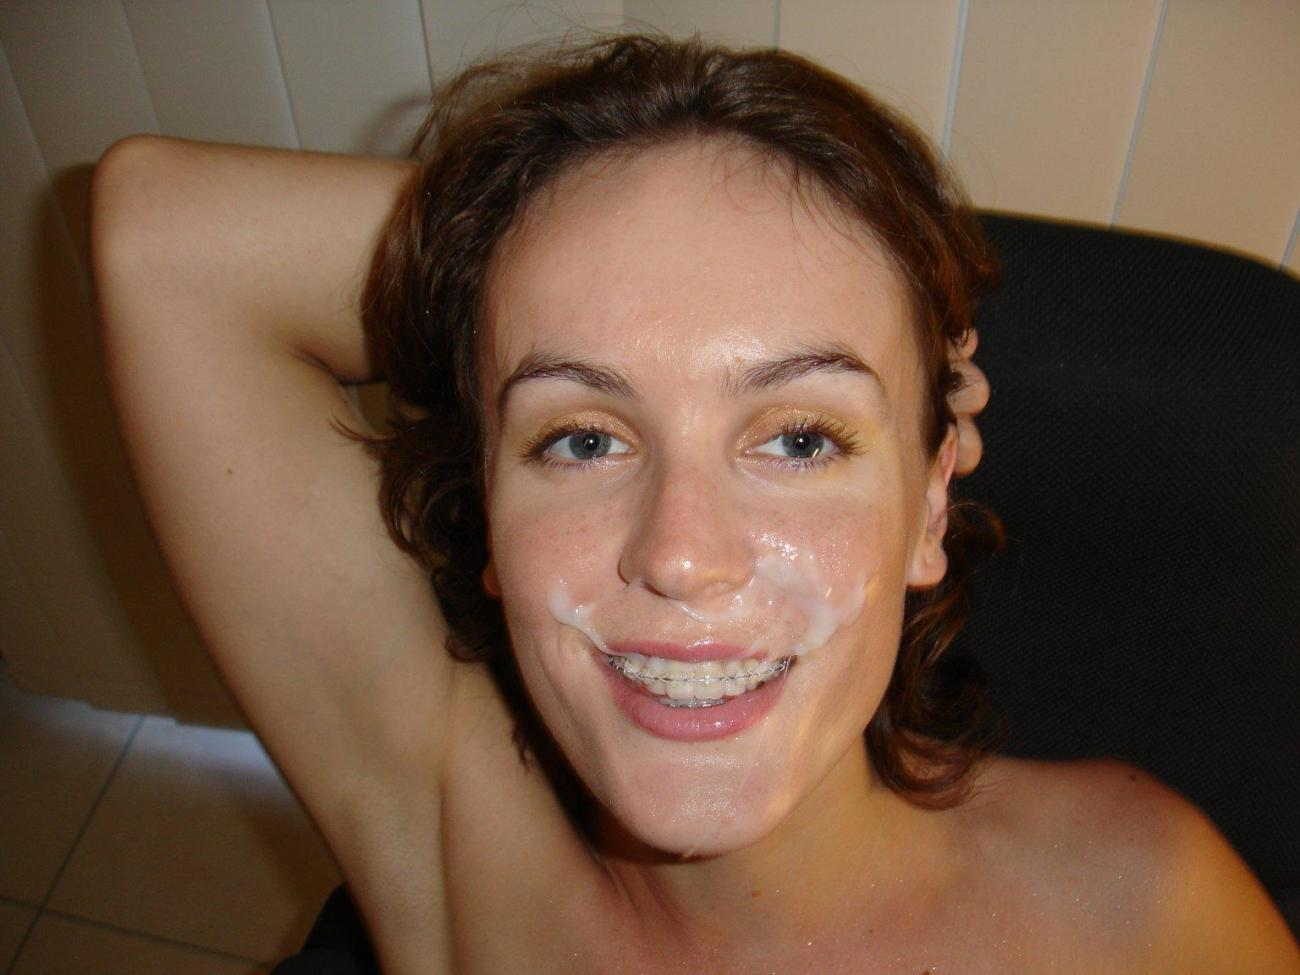 Nude Girls With Braces Cum Facial